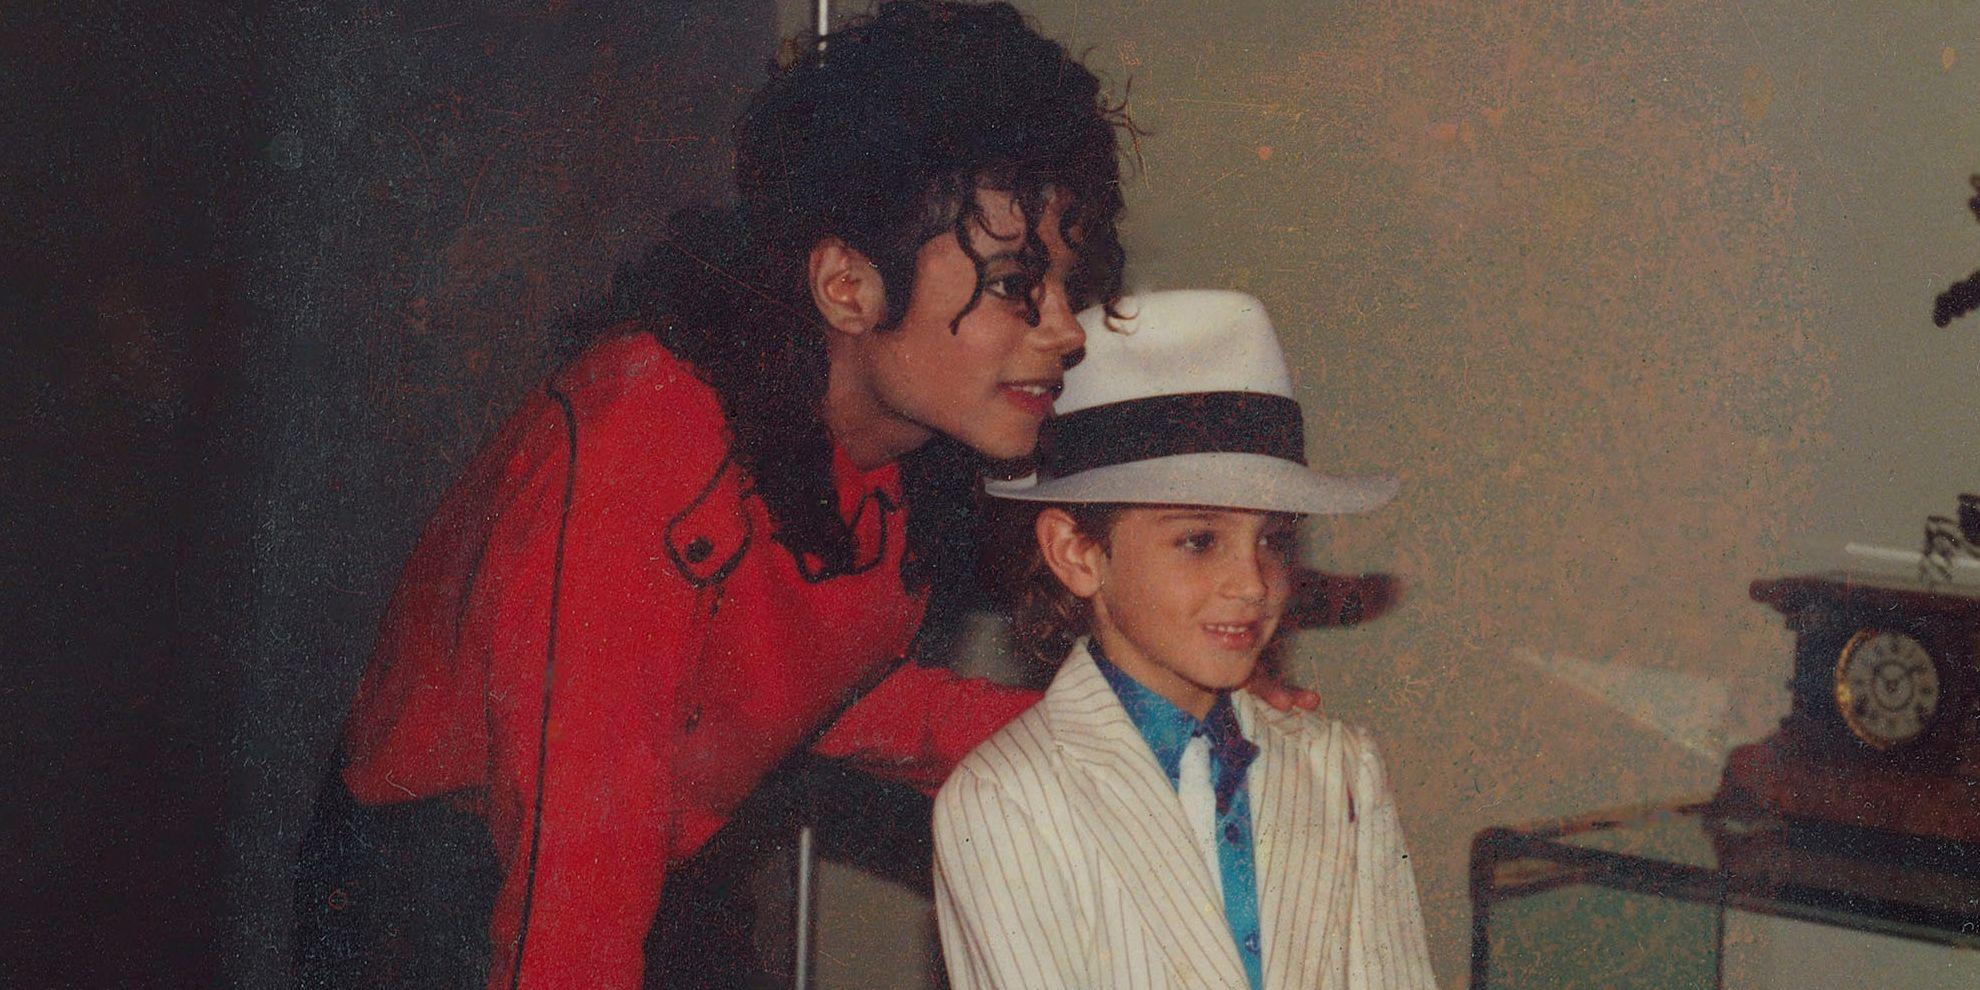 Leaving Neverland: Michael Jackson and Me, Wade Robson